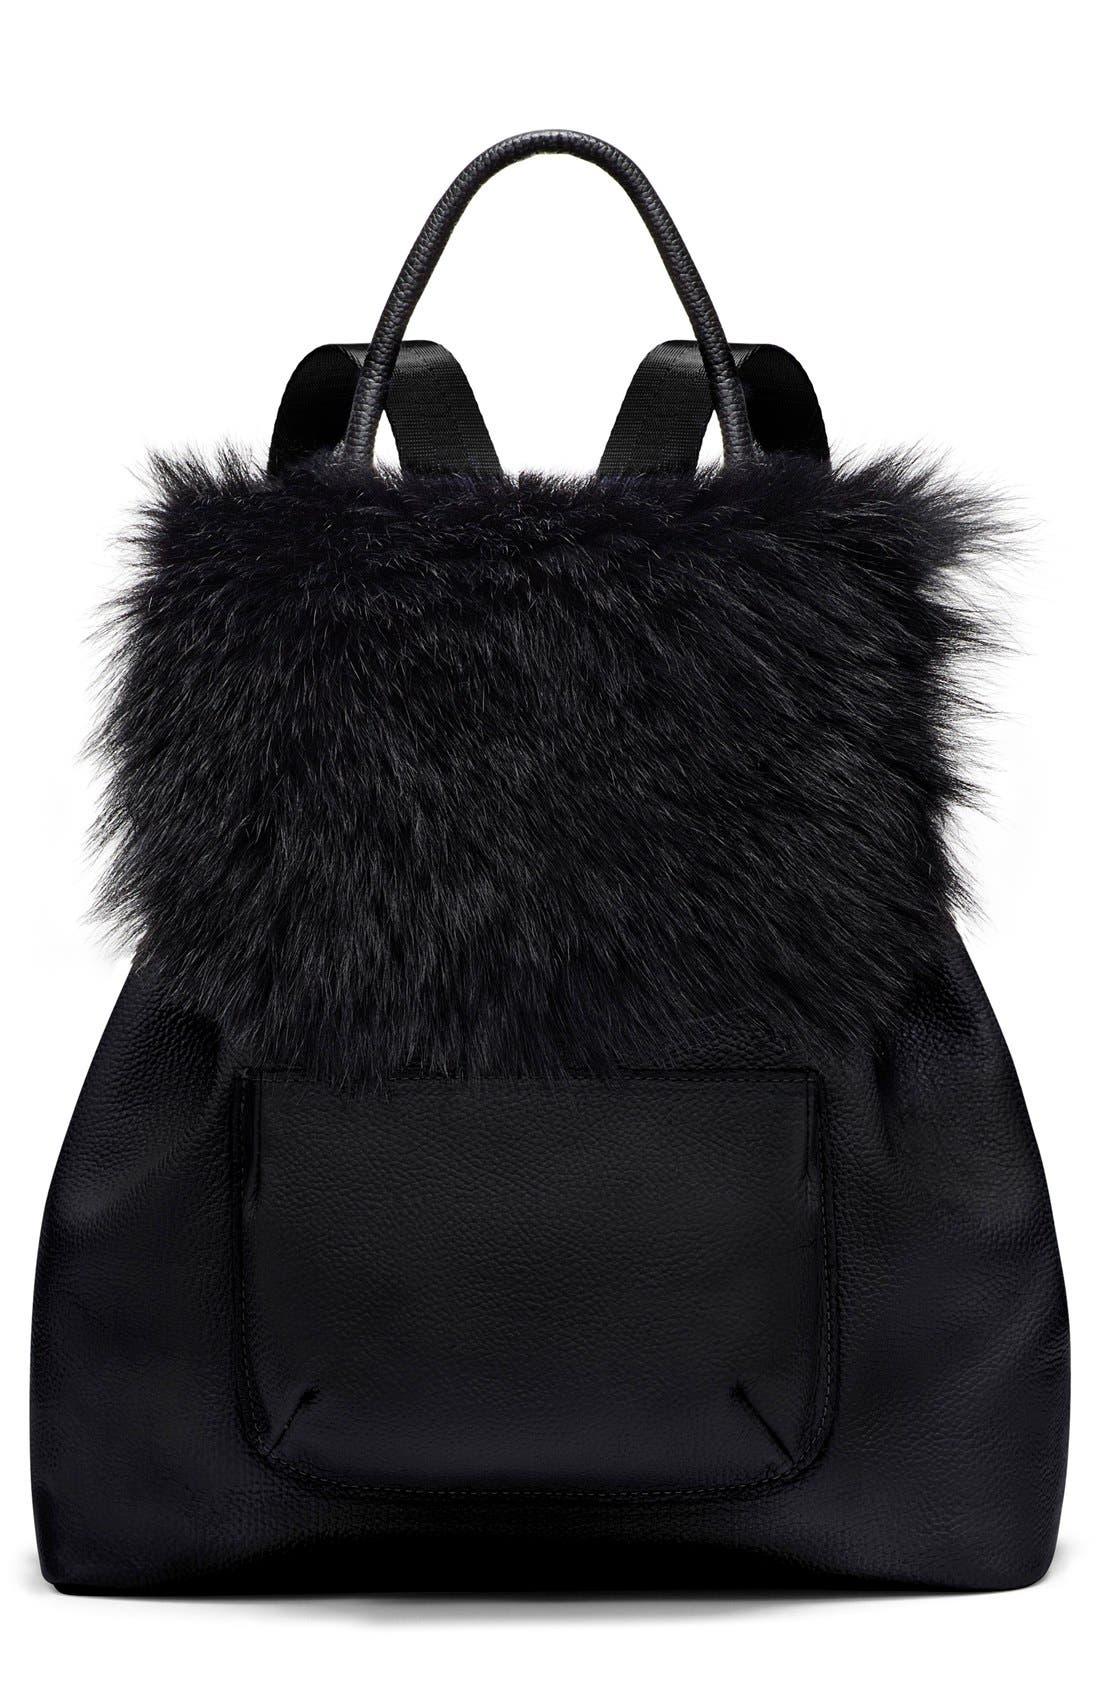 Alternate Image 1 Selected - Elizabeth and James 'Langley' Leather & Genuine Sheep Fur Backpack